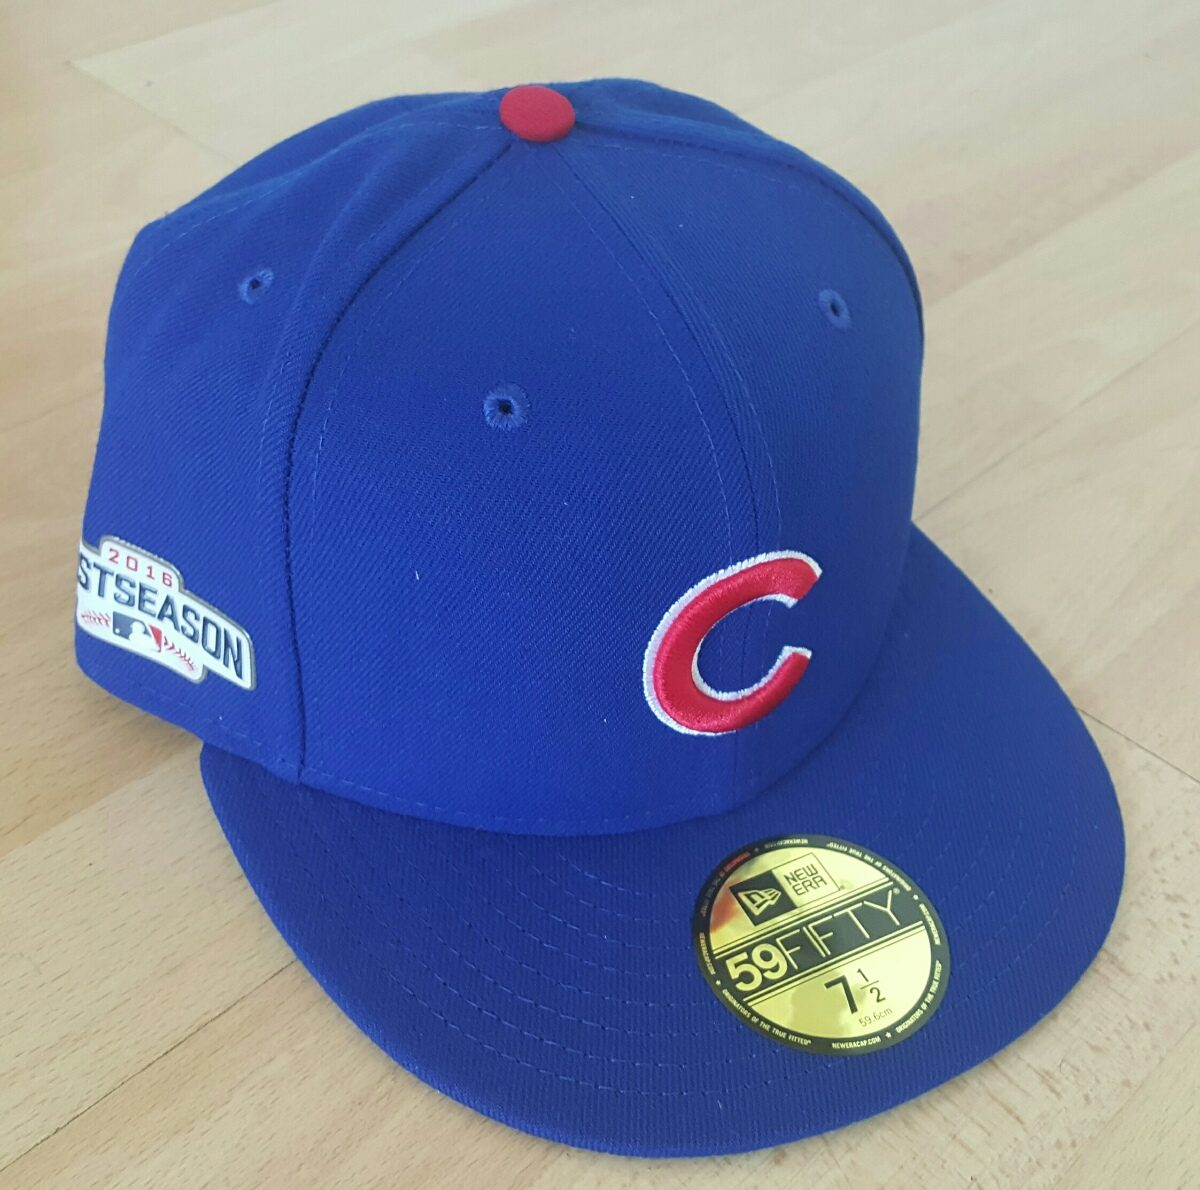 Gorra New Era Original Chicago Cubs Post Season Mlb -   549.00 en ... 41983dd725a